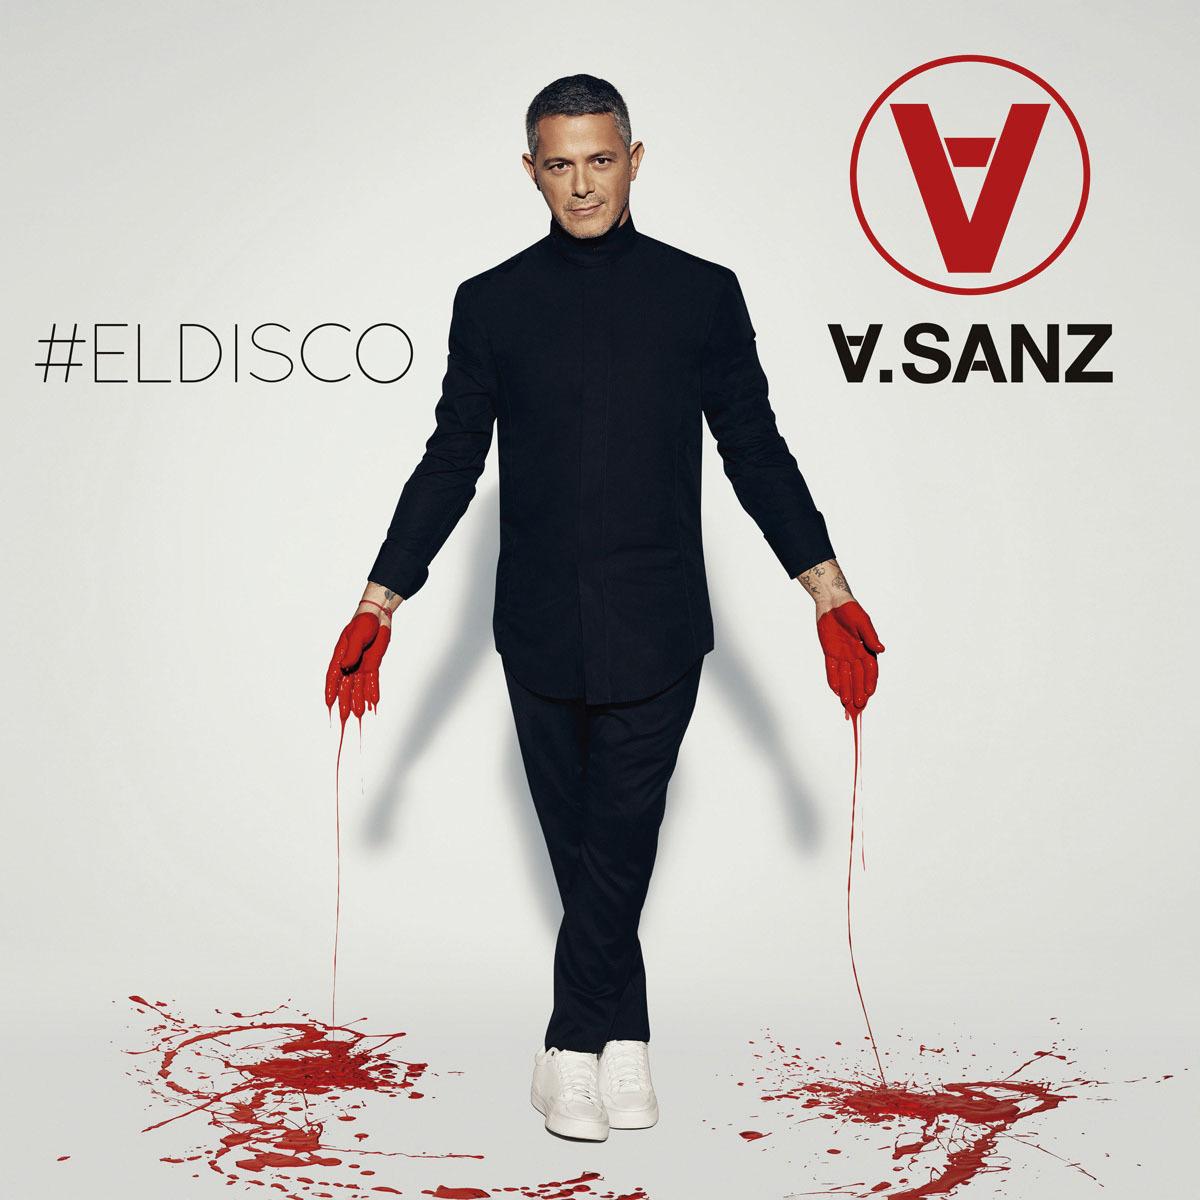 alejandro sanz #eldisco - portada -myipop